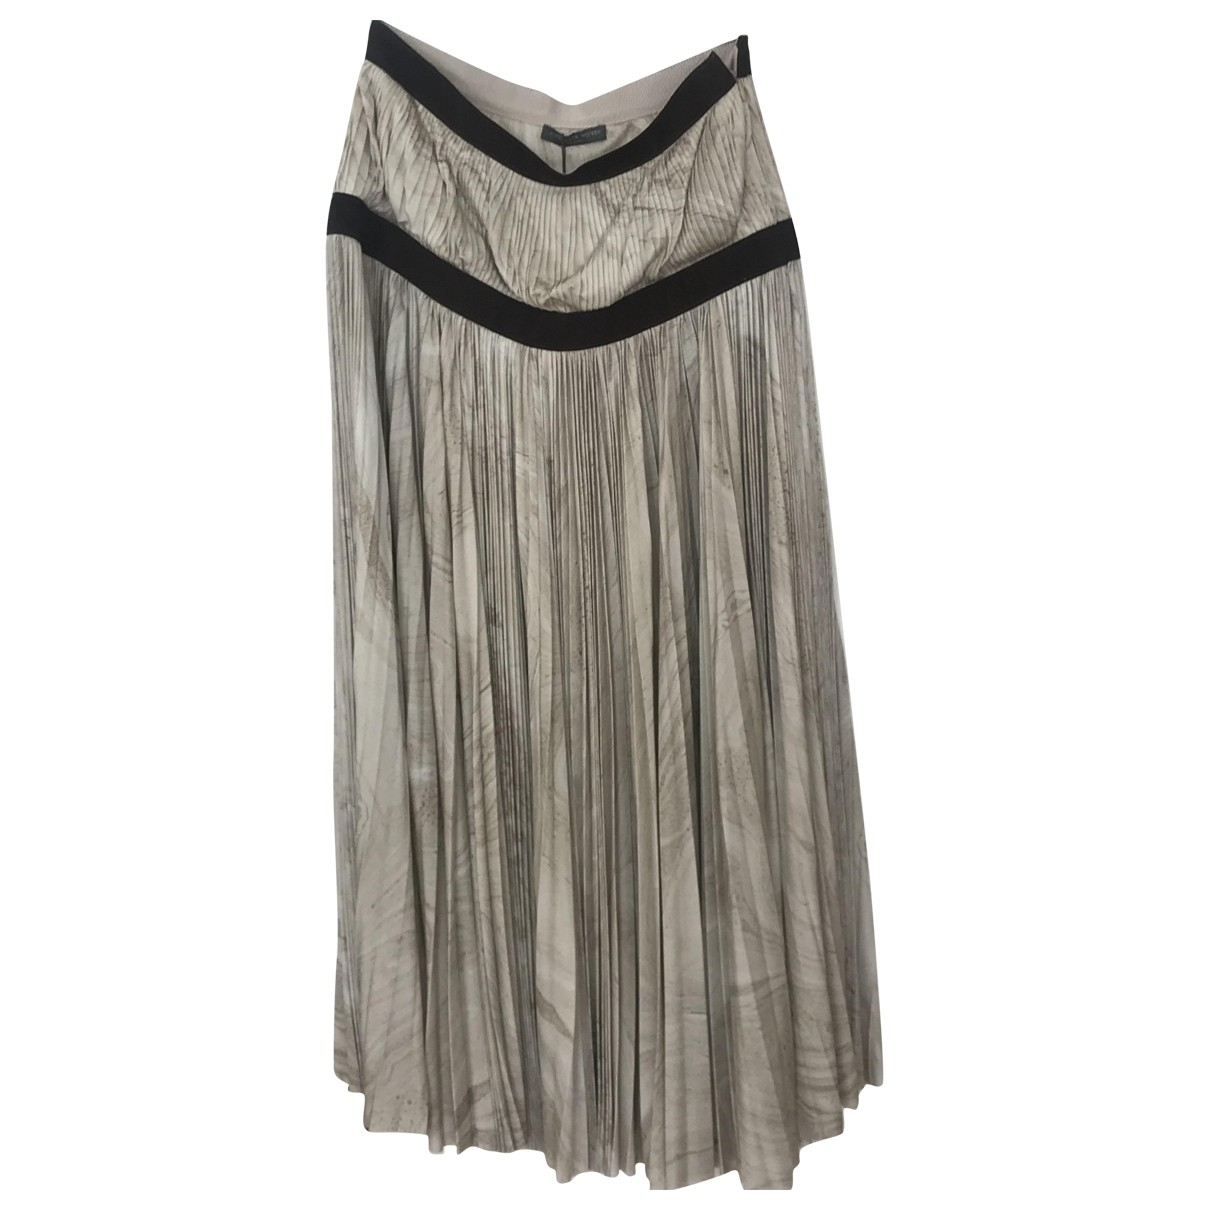 Alexander Mcqueen \N Beige Silk skirt for Women 42 IT